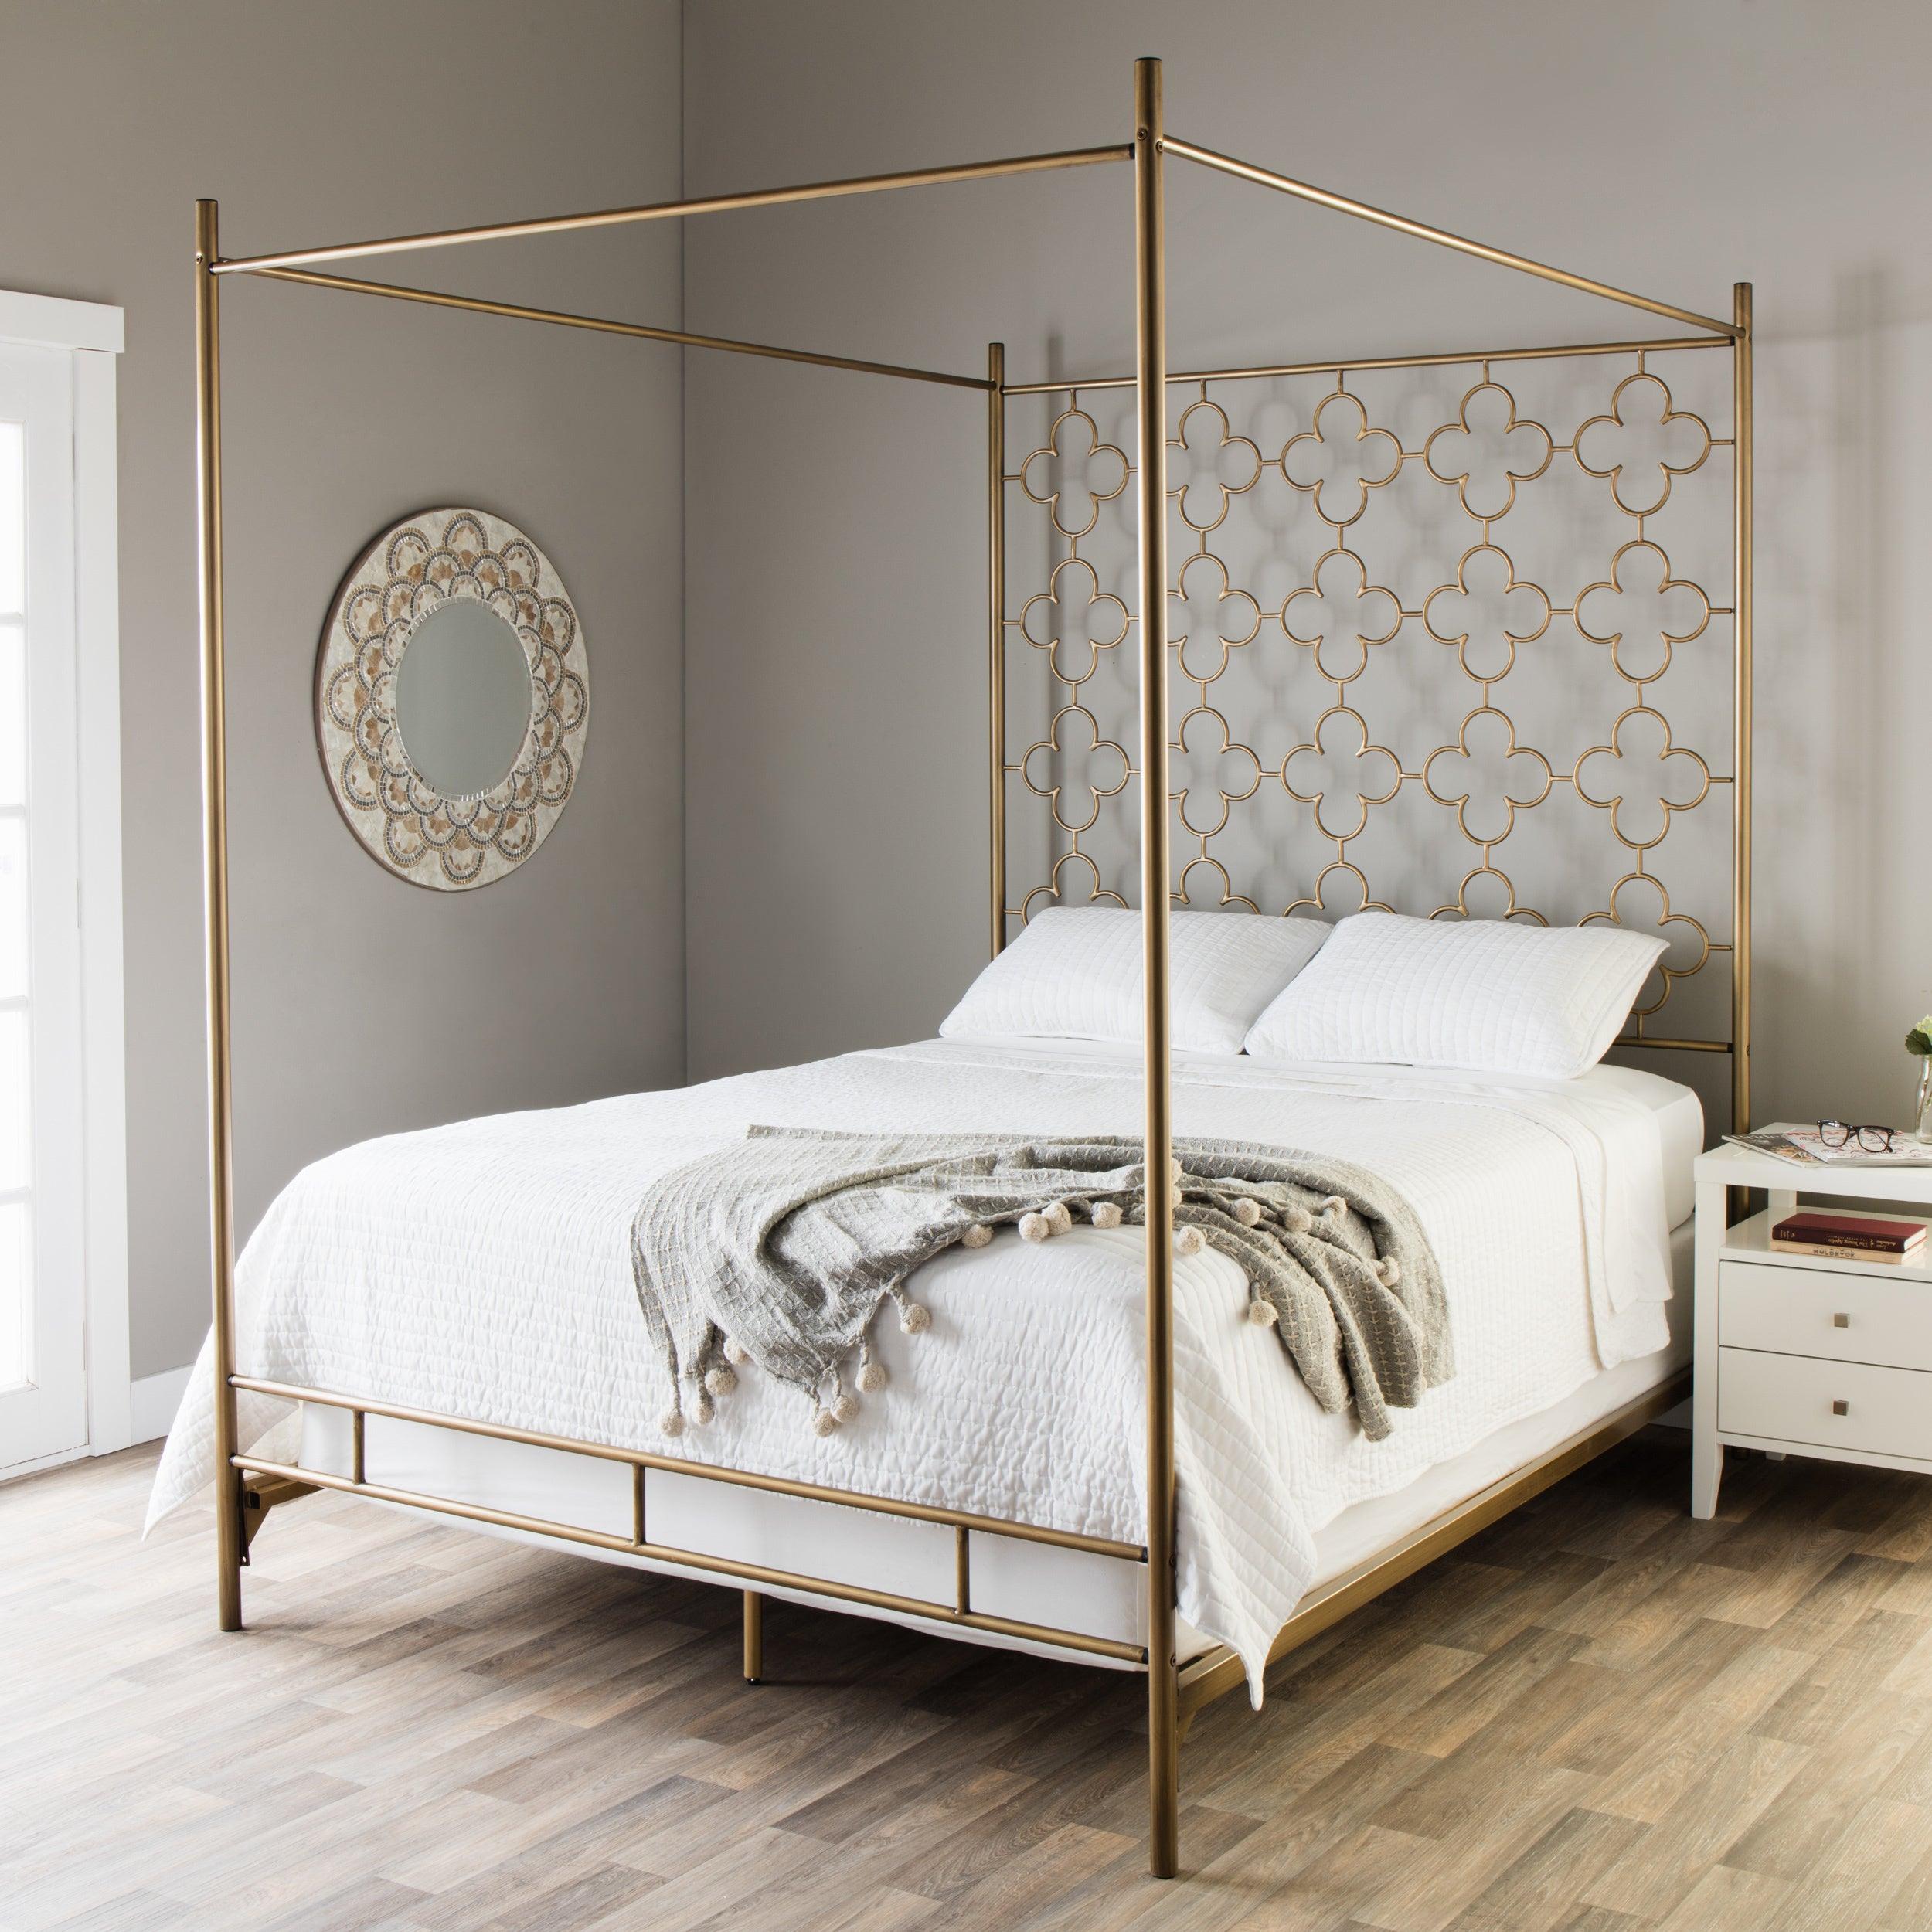 Retro Glitz Brushed Goldtone Quatrefoil Queen Canopy Bed